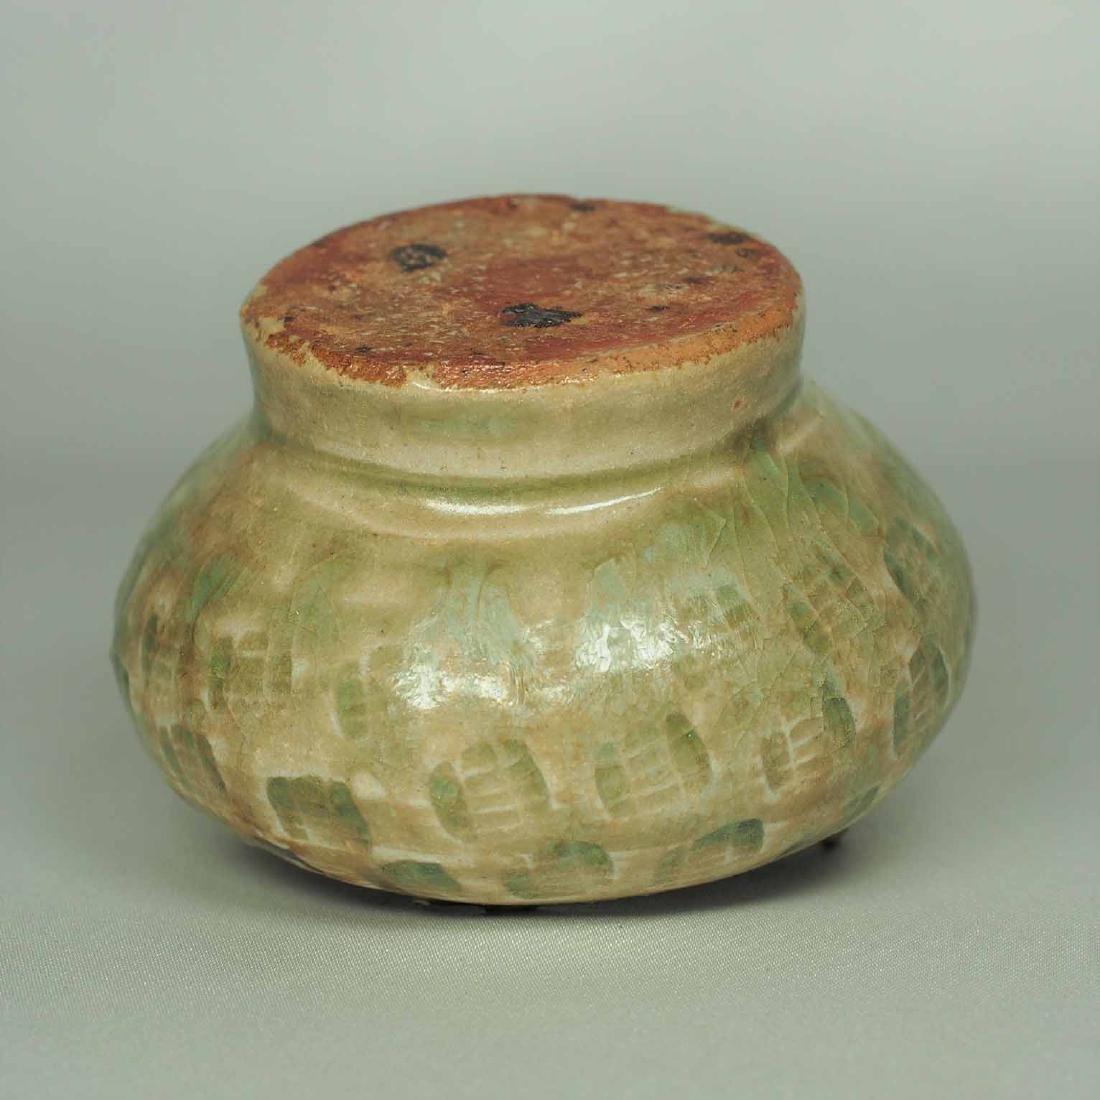 Lidded Water Pot with Brown Spot, Eastern Jin Dynasty - 8